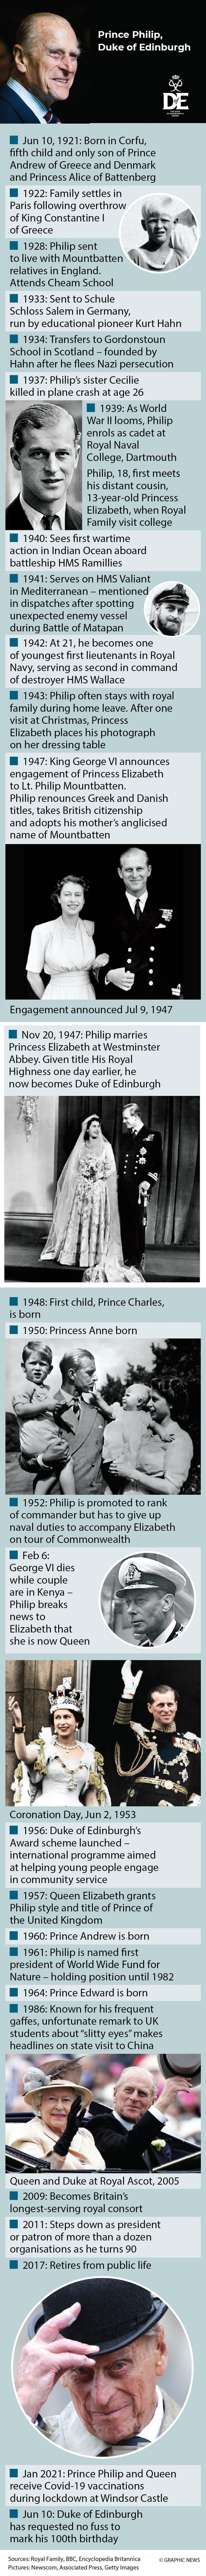 Profile of Prince Philip, Duke of Edinburgh